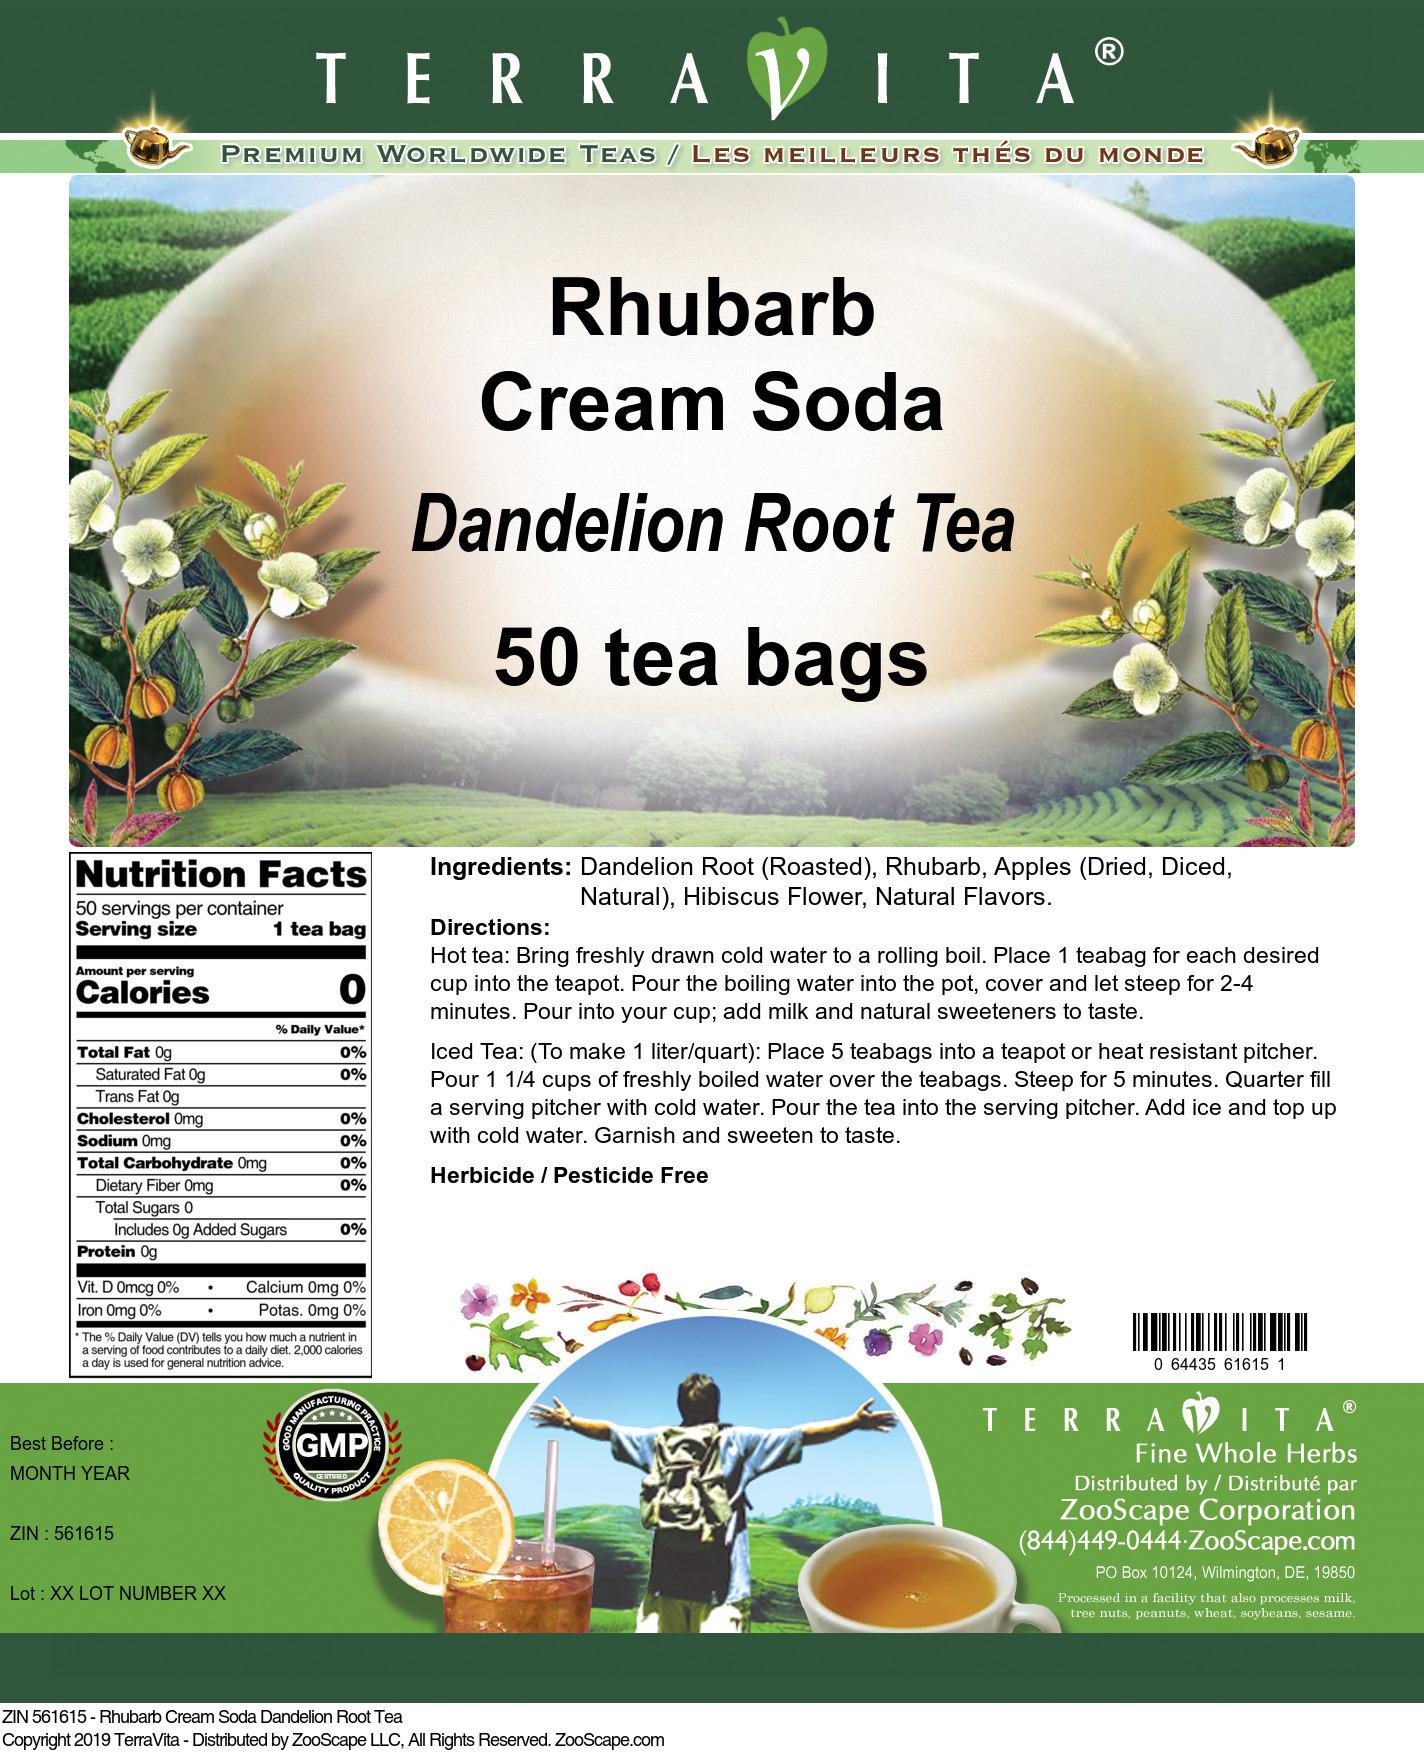 Rhubarb Cream Soda Dandelion Root